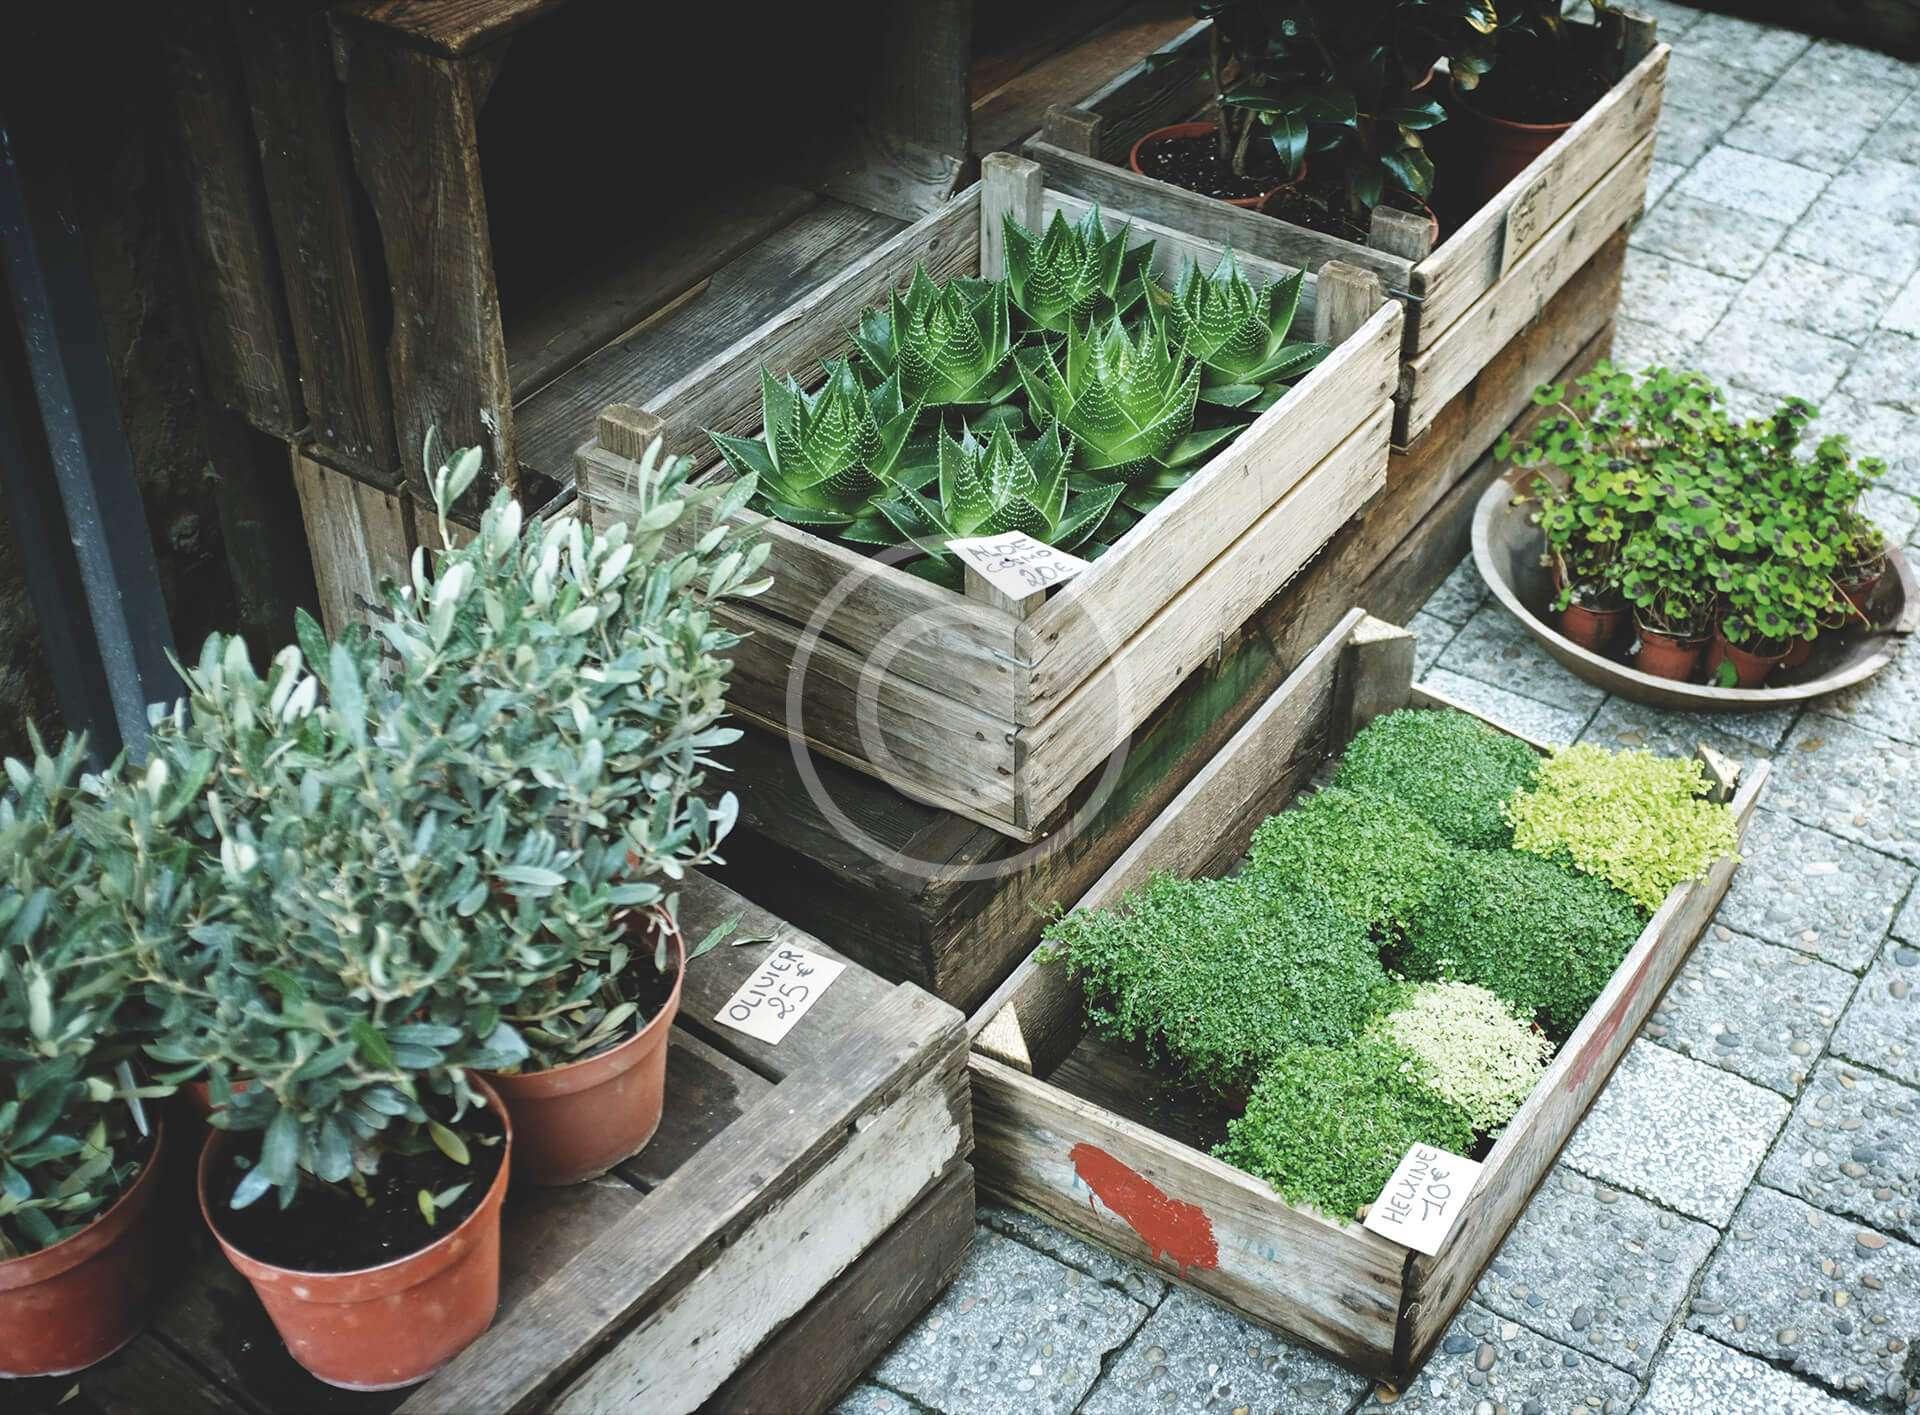 Support the garden maintenance